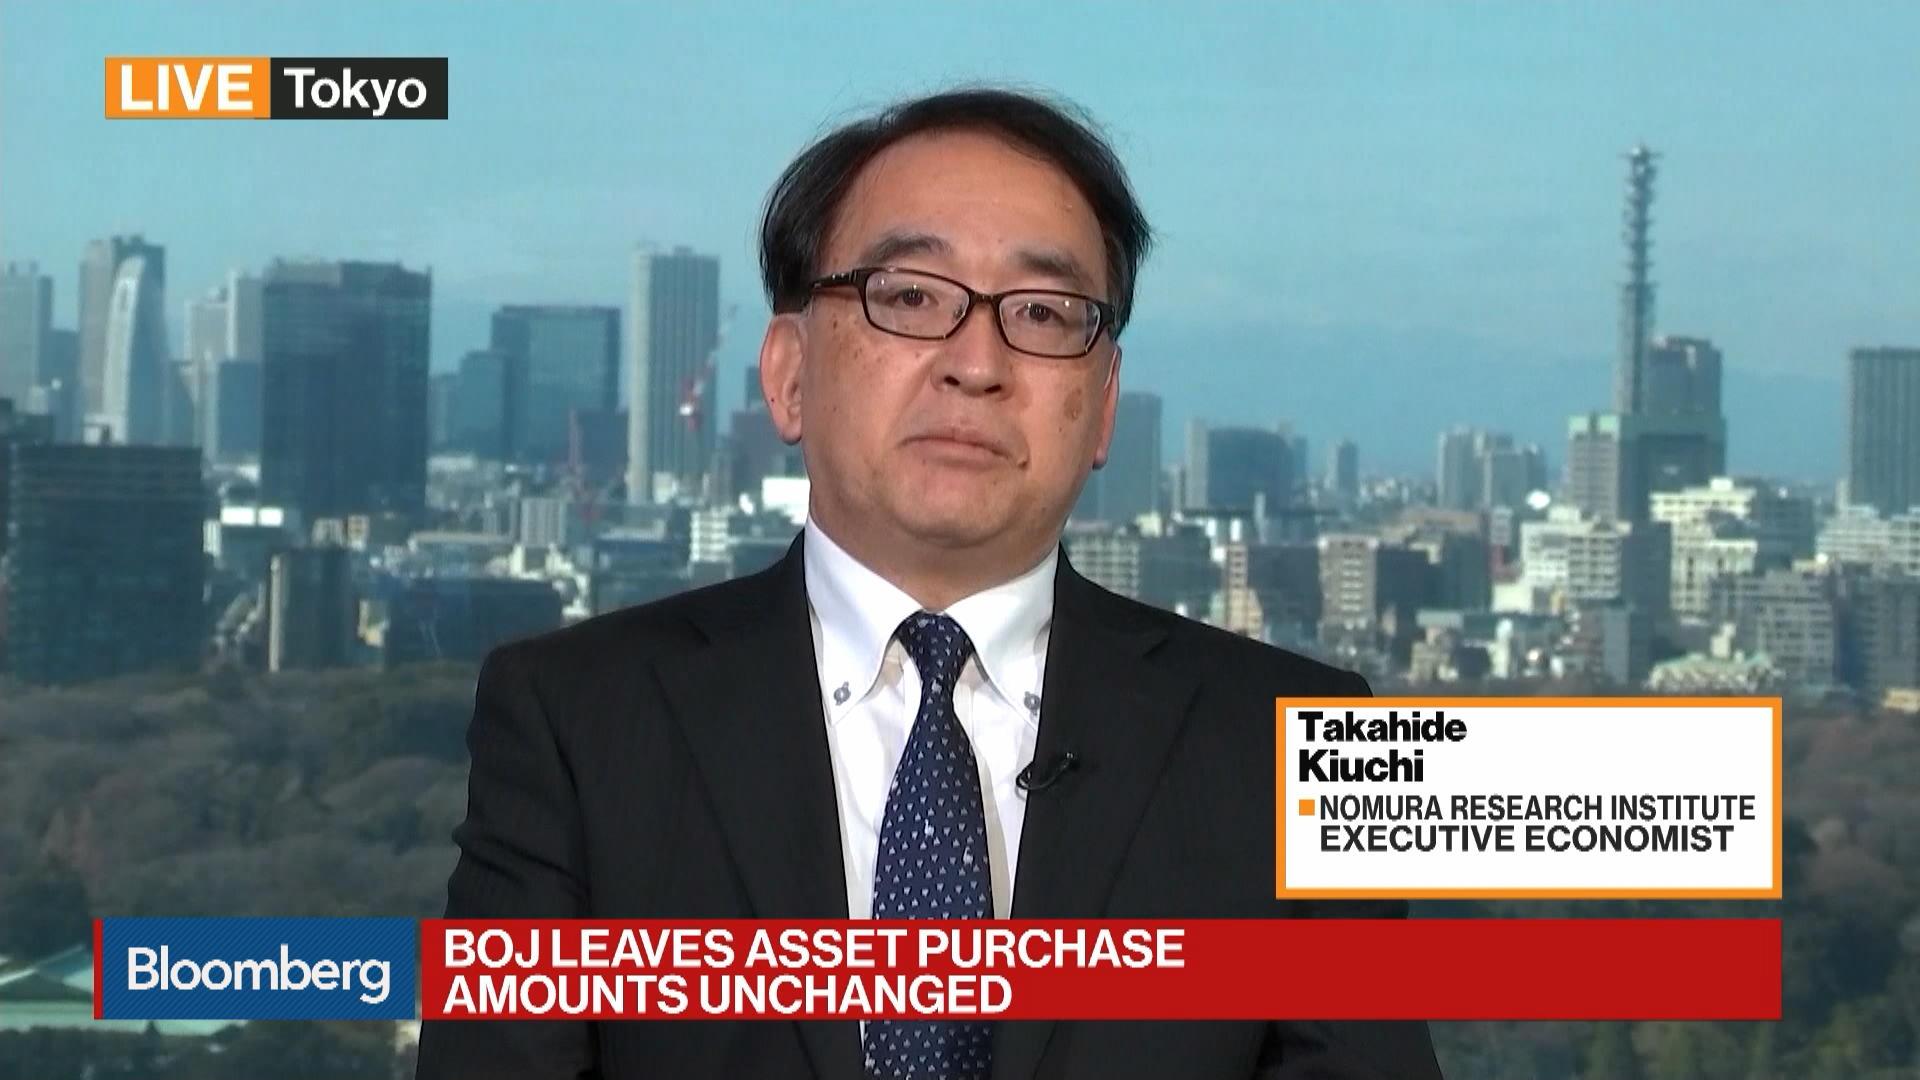 BOJ Leaves Asset Purchase Amounts Unchanged